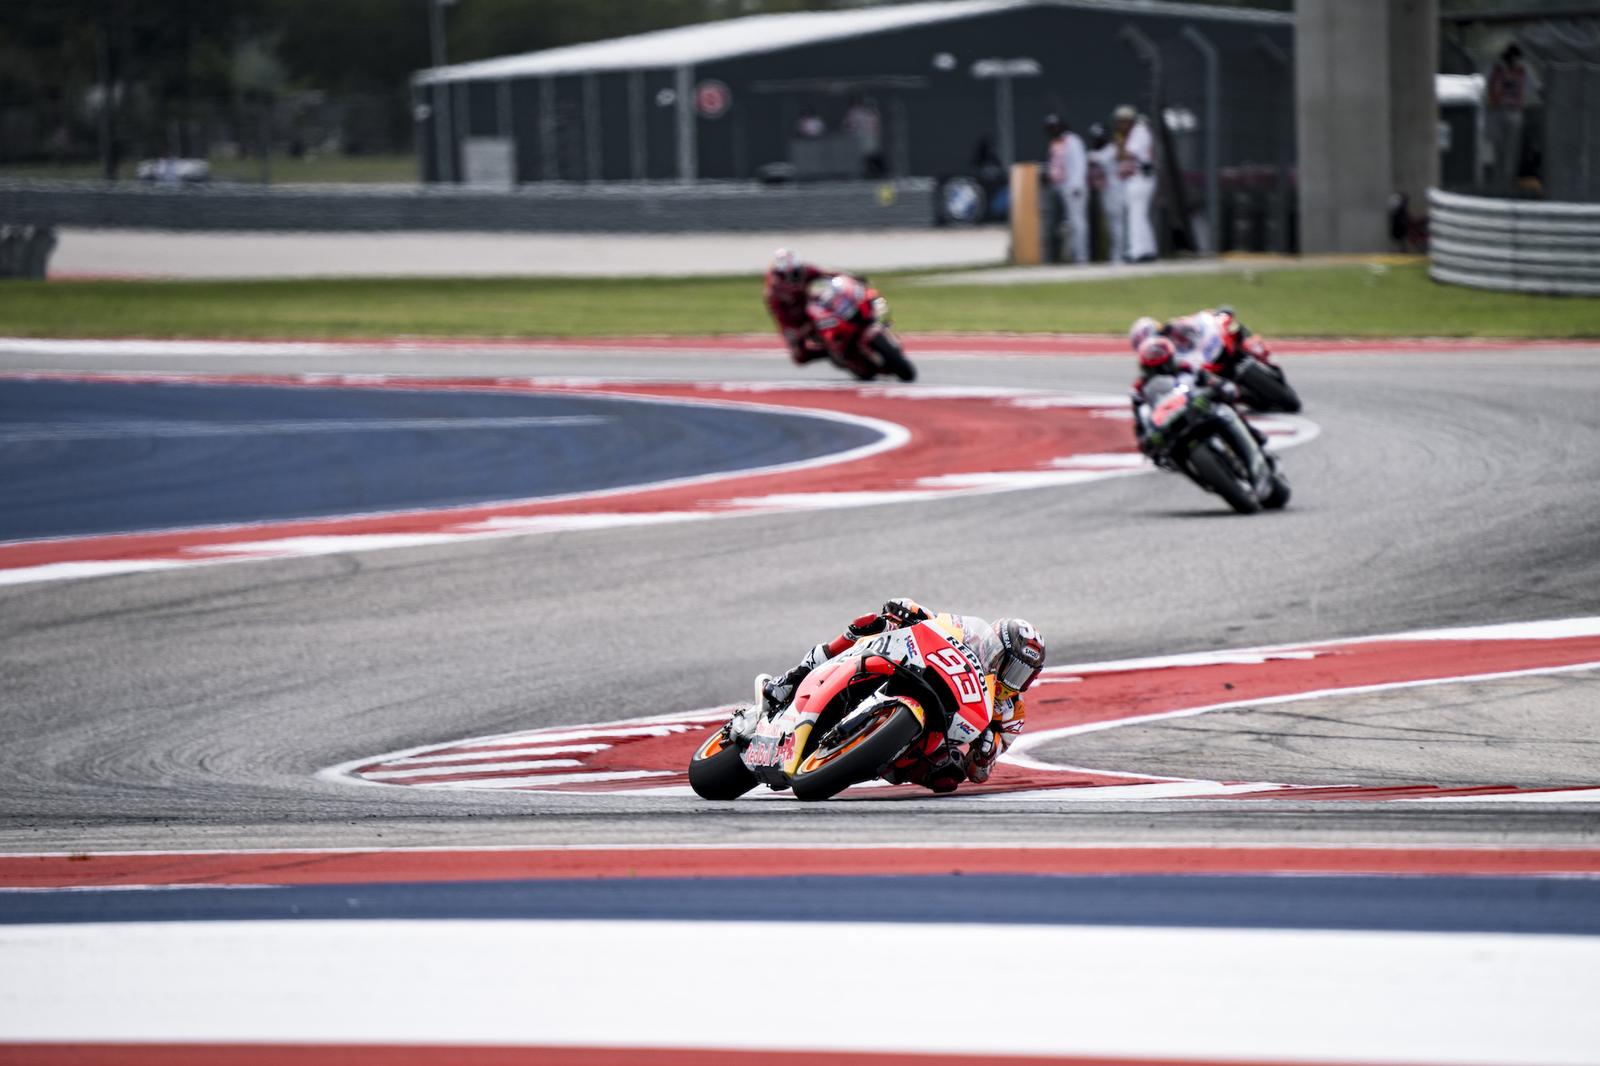 Marc Marquez podczas MotoGP na COTA w Austin (Teksas, USA)